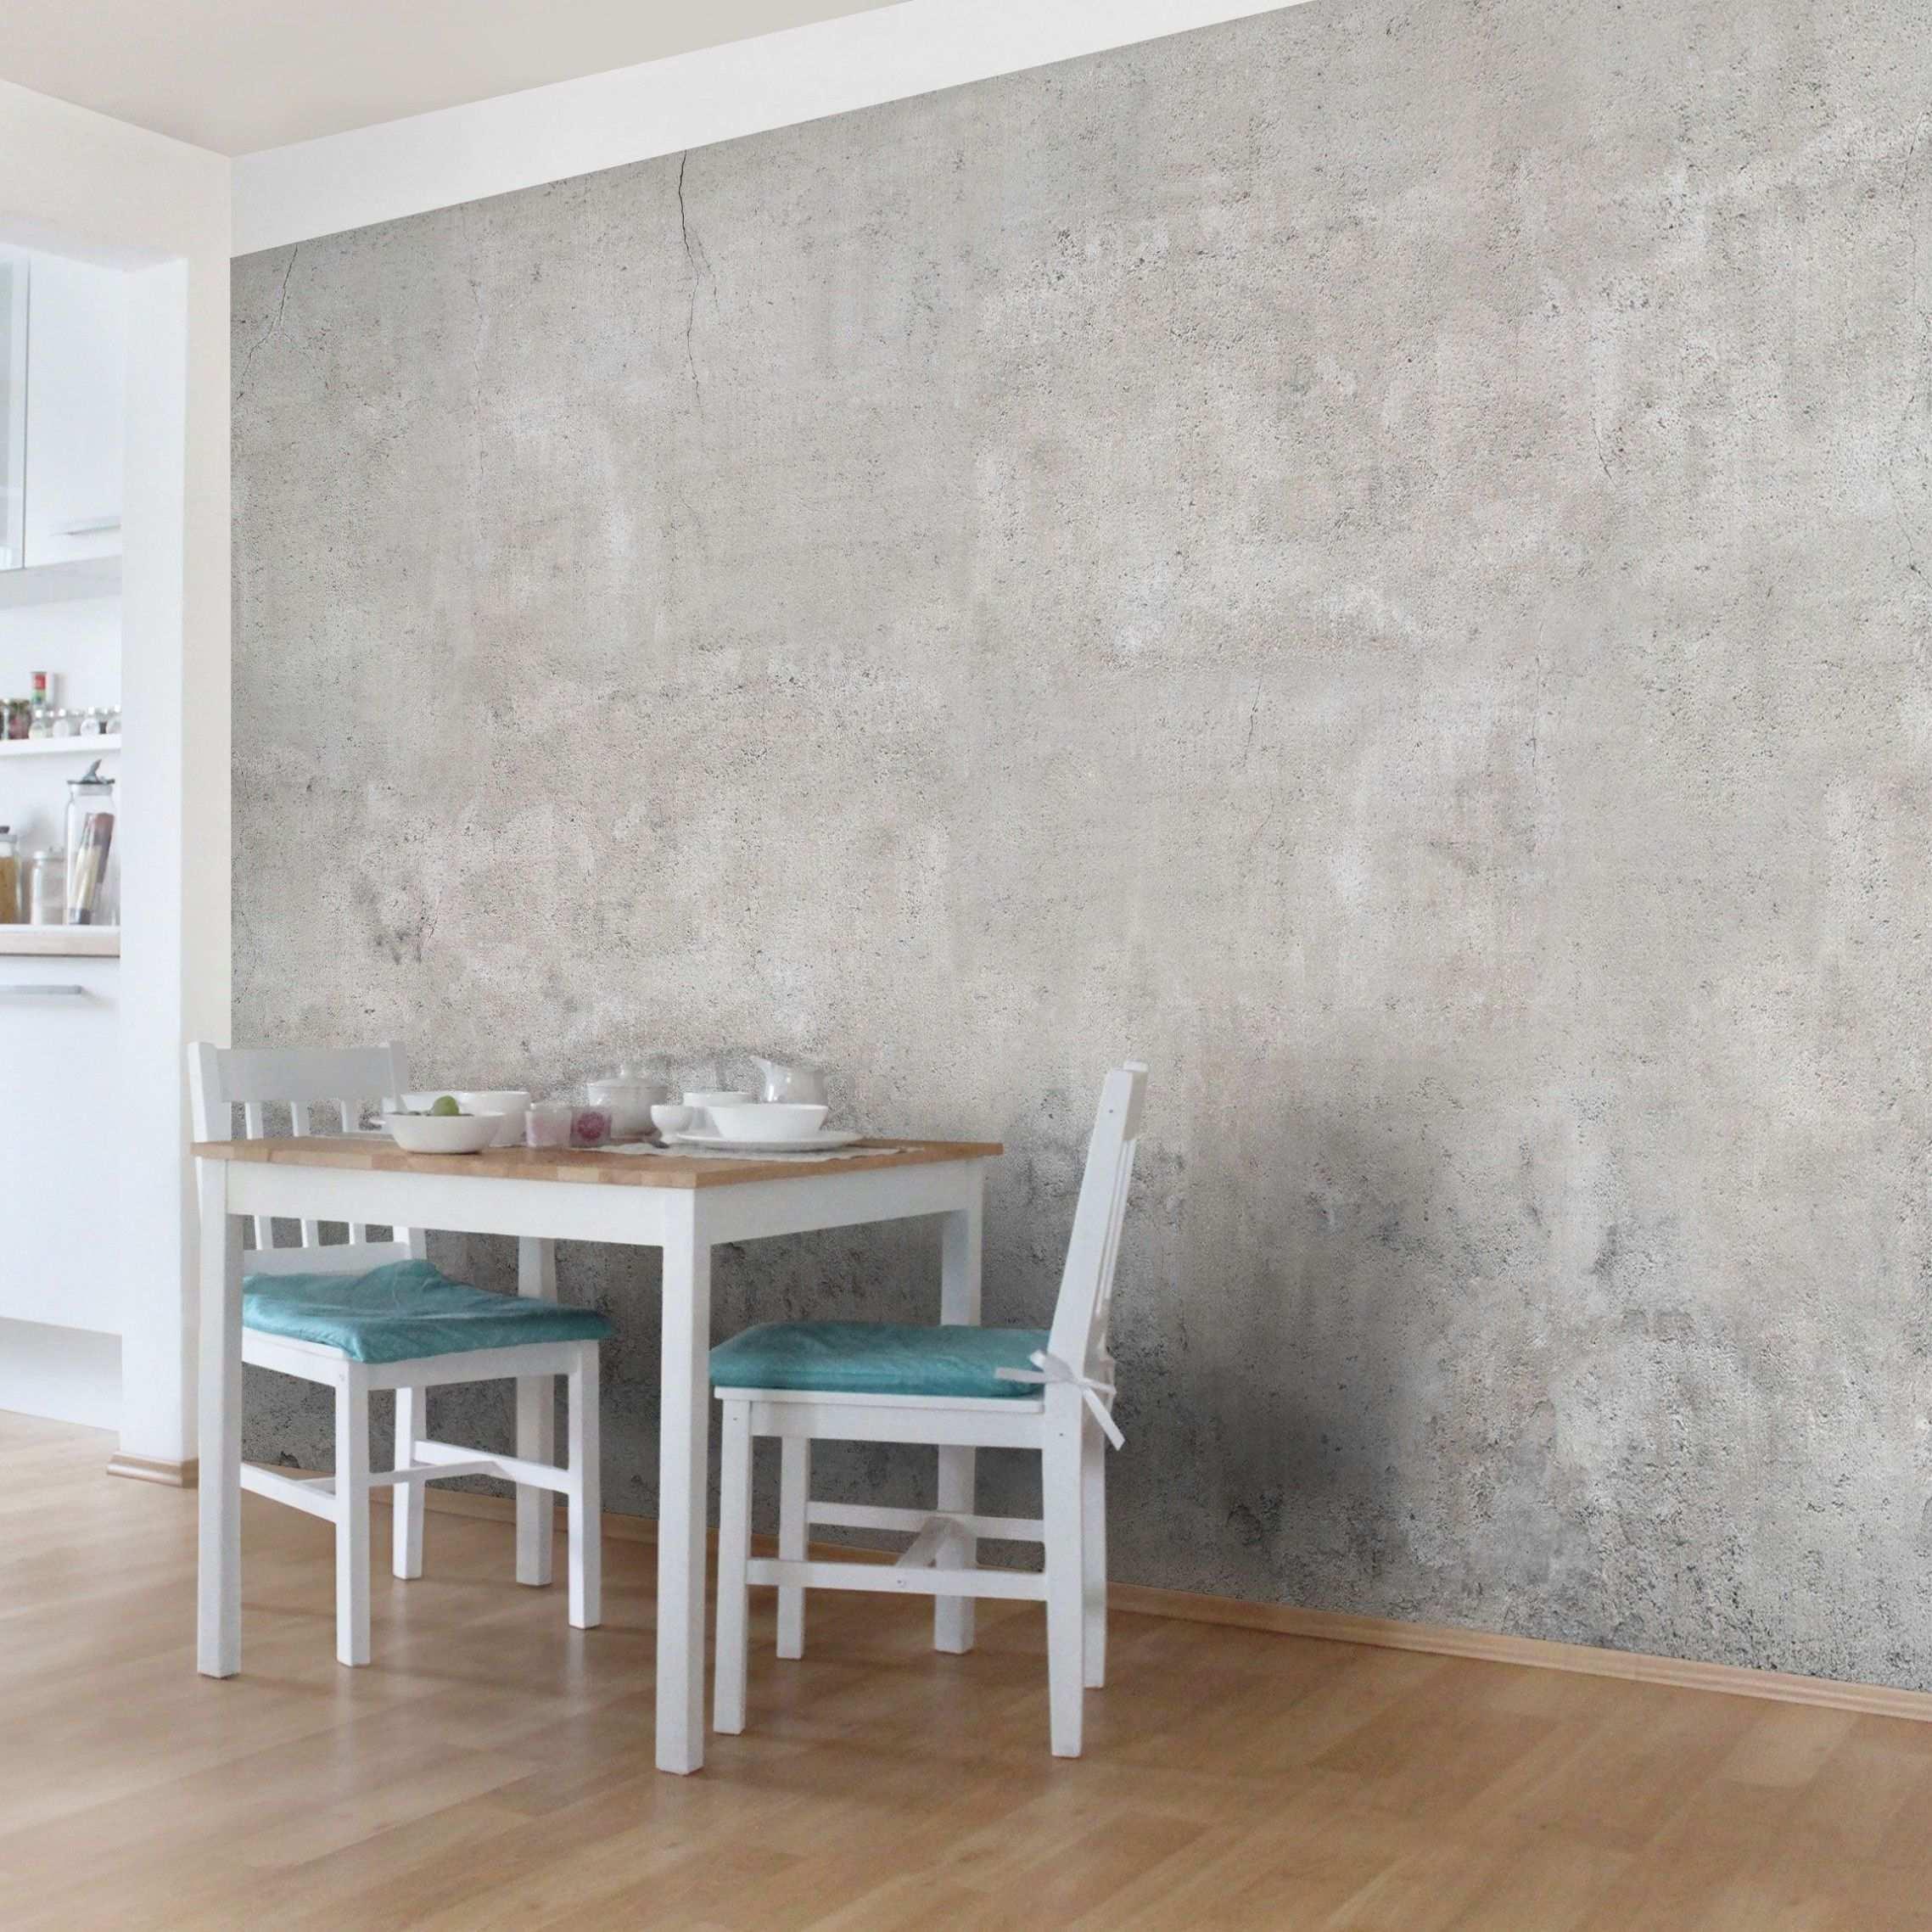 Muster Tapete Wohnzimmer Wohnideen Wohnzimmer Tapete Concrete Wallpaper Home Decor Wallpaper Living Room